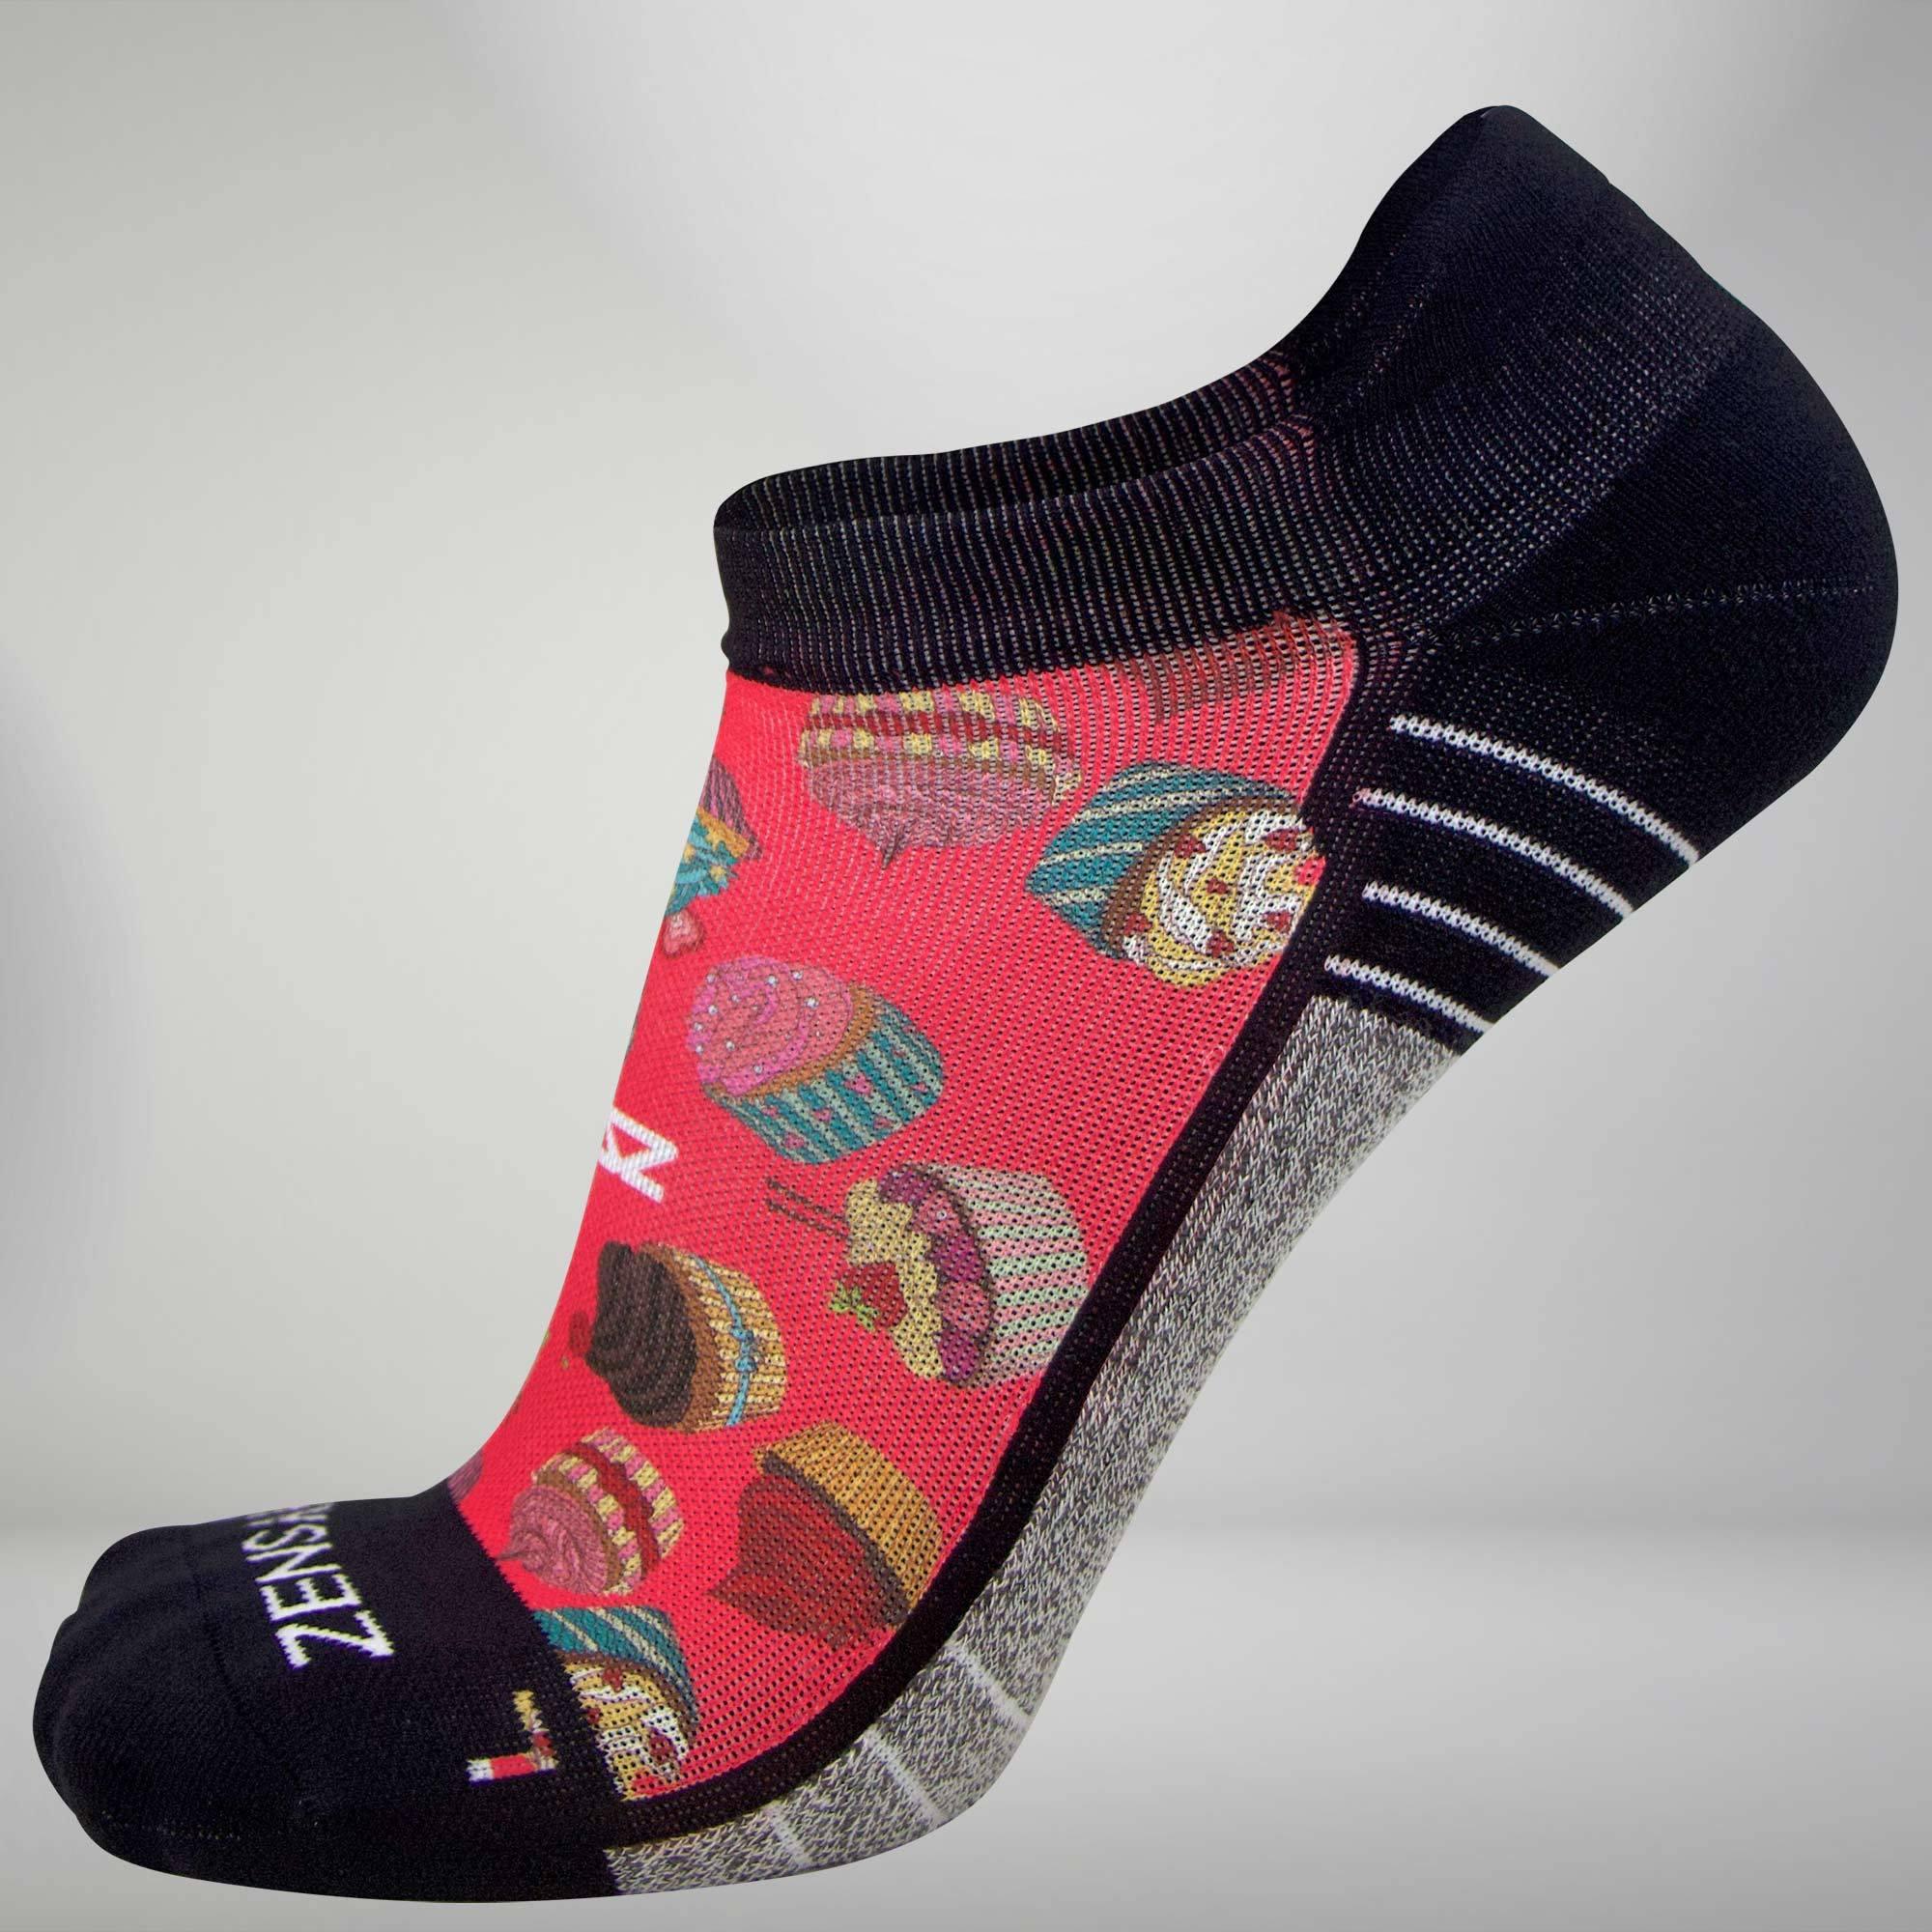 Zensah CUpcakes Socks (No Show) S / Coral